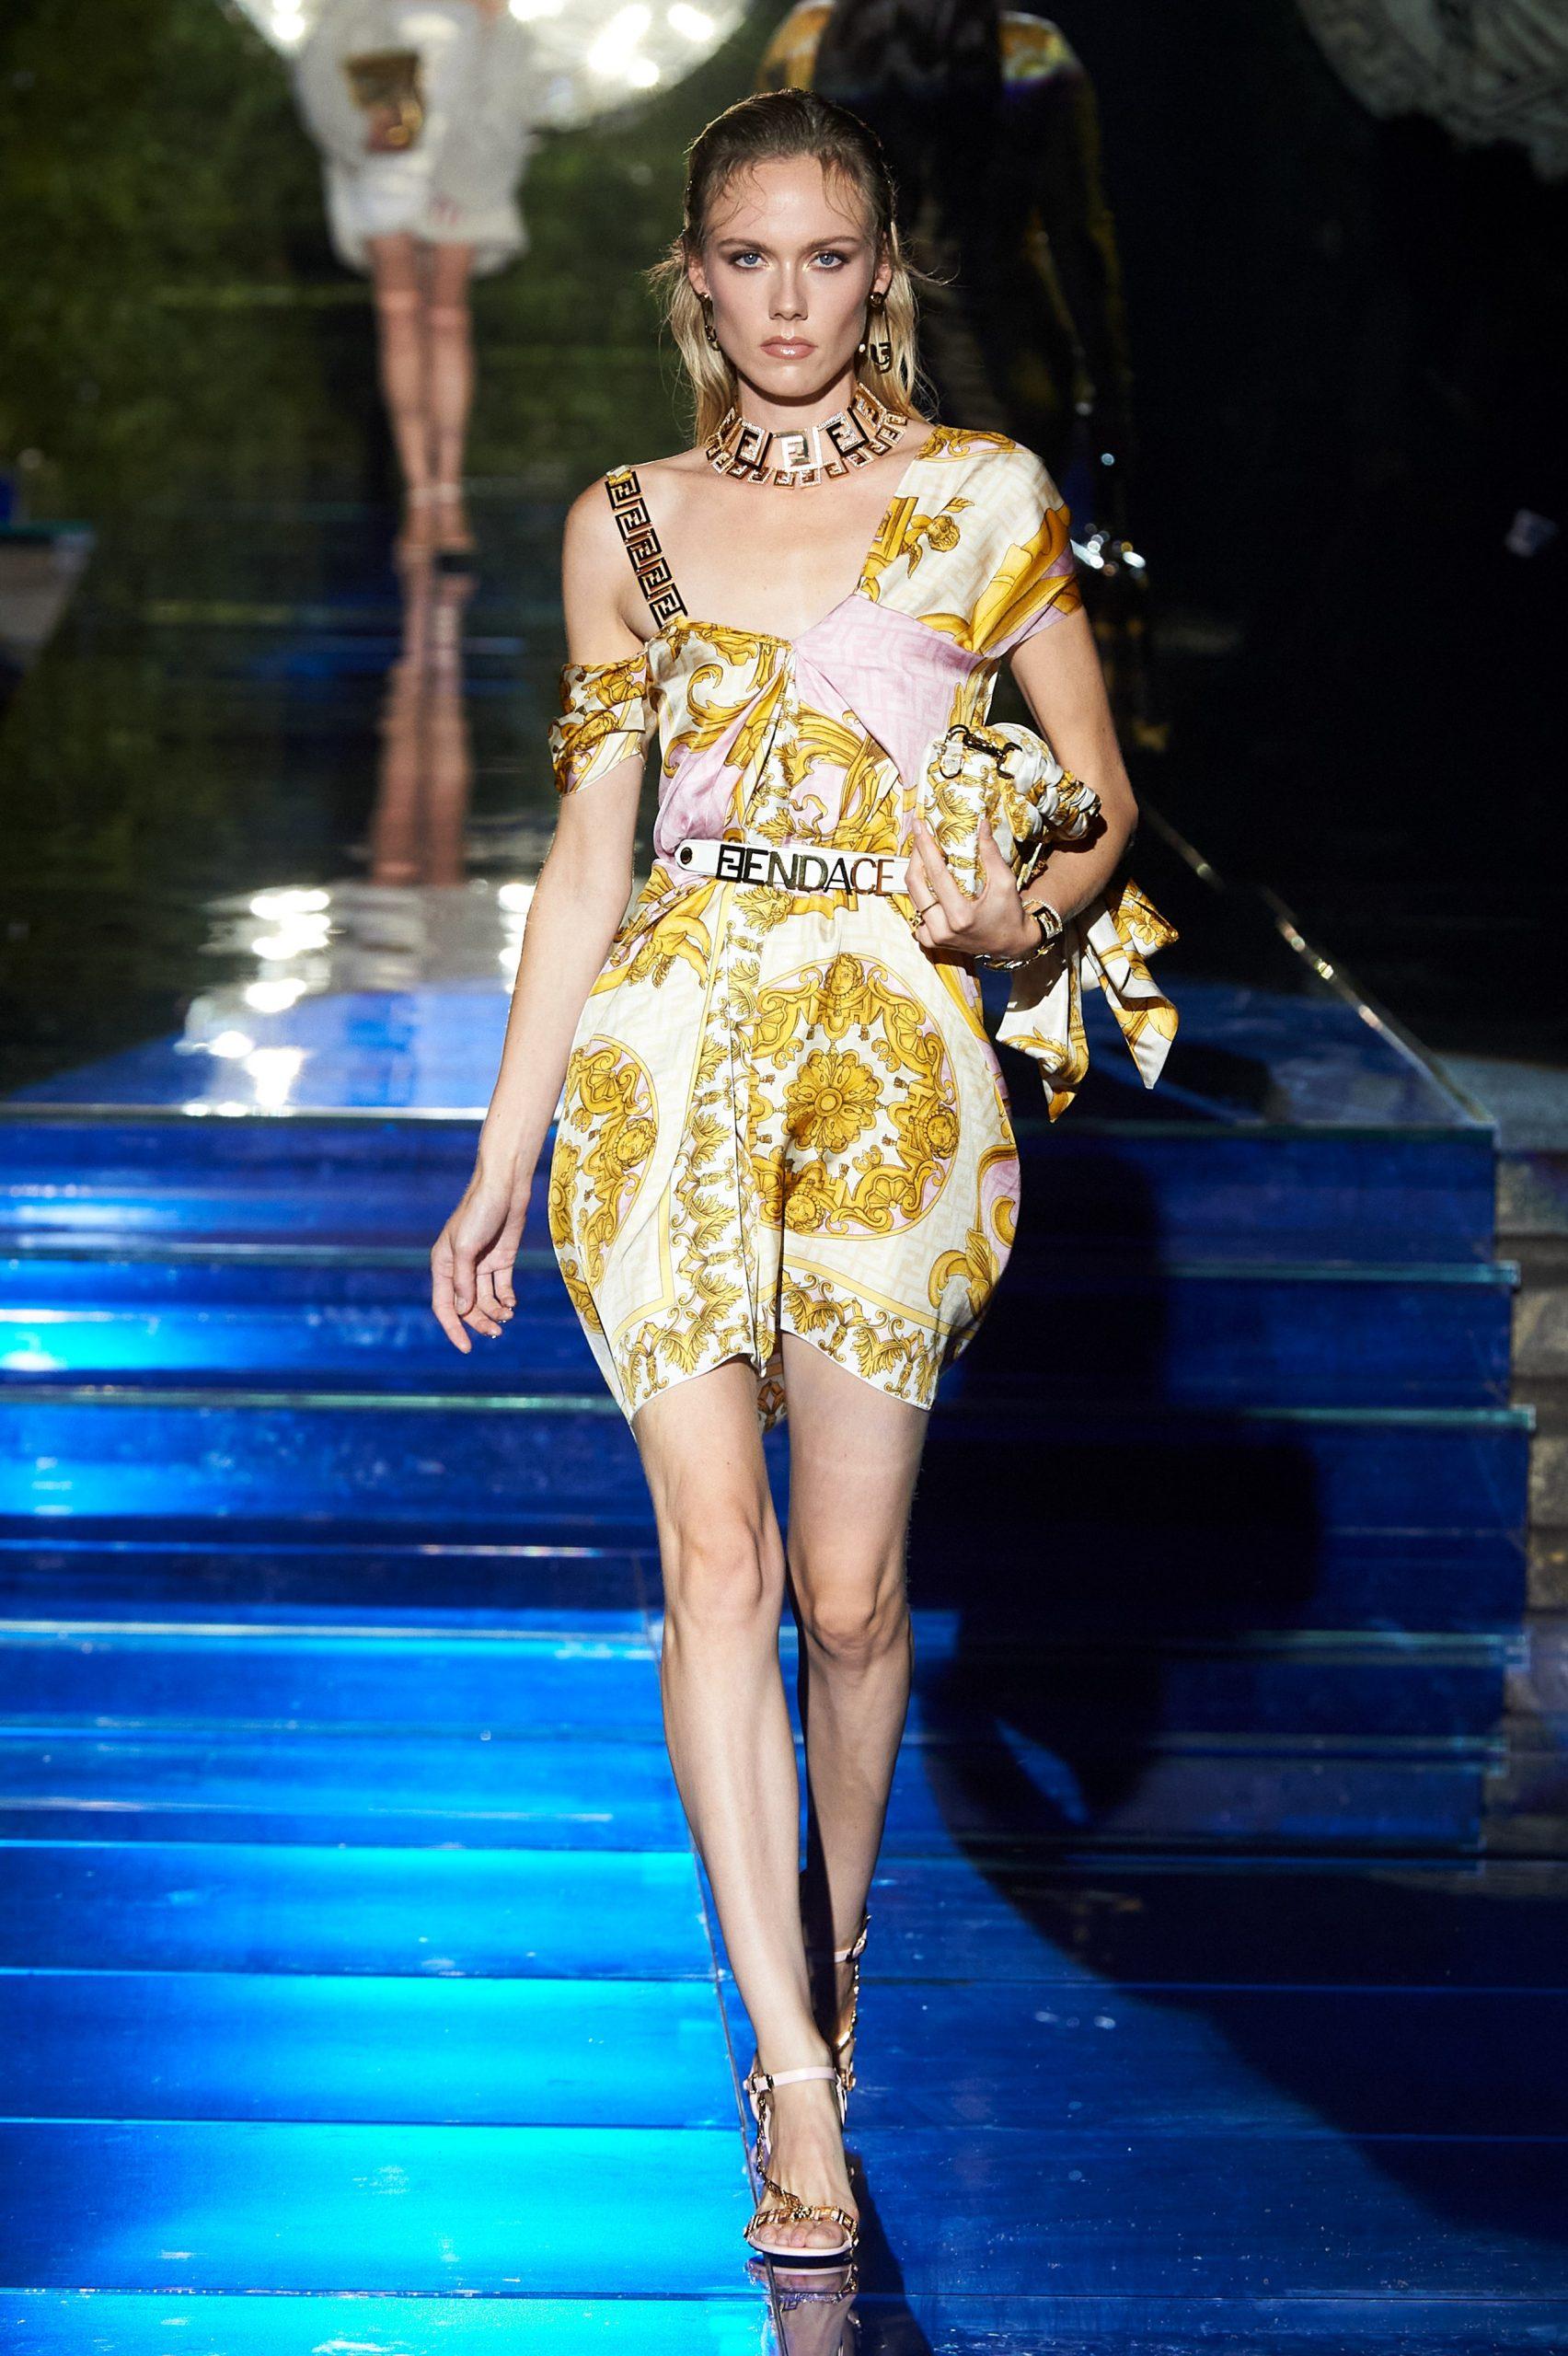 Váy Fendace